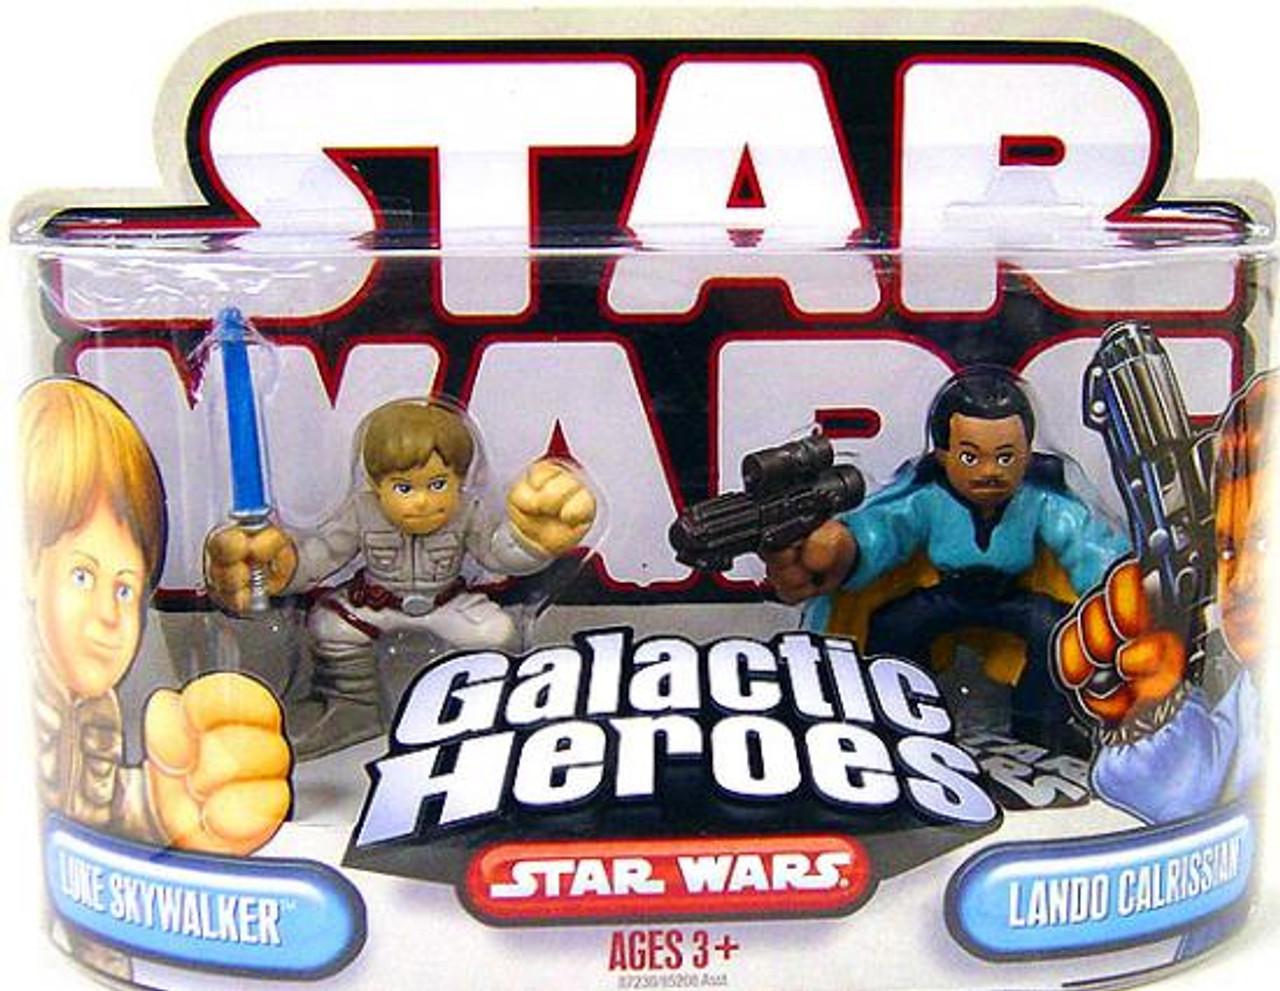 Star Wars Empire Strikes Back Galactic Heroes 2007 Luke Skywalker & Lando Calrissian Mini Figure